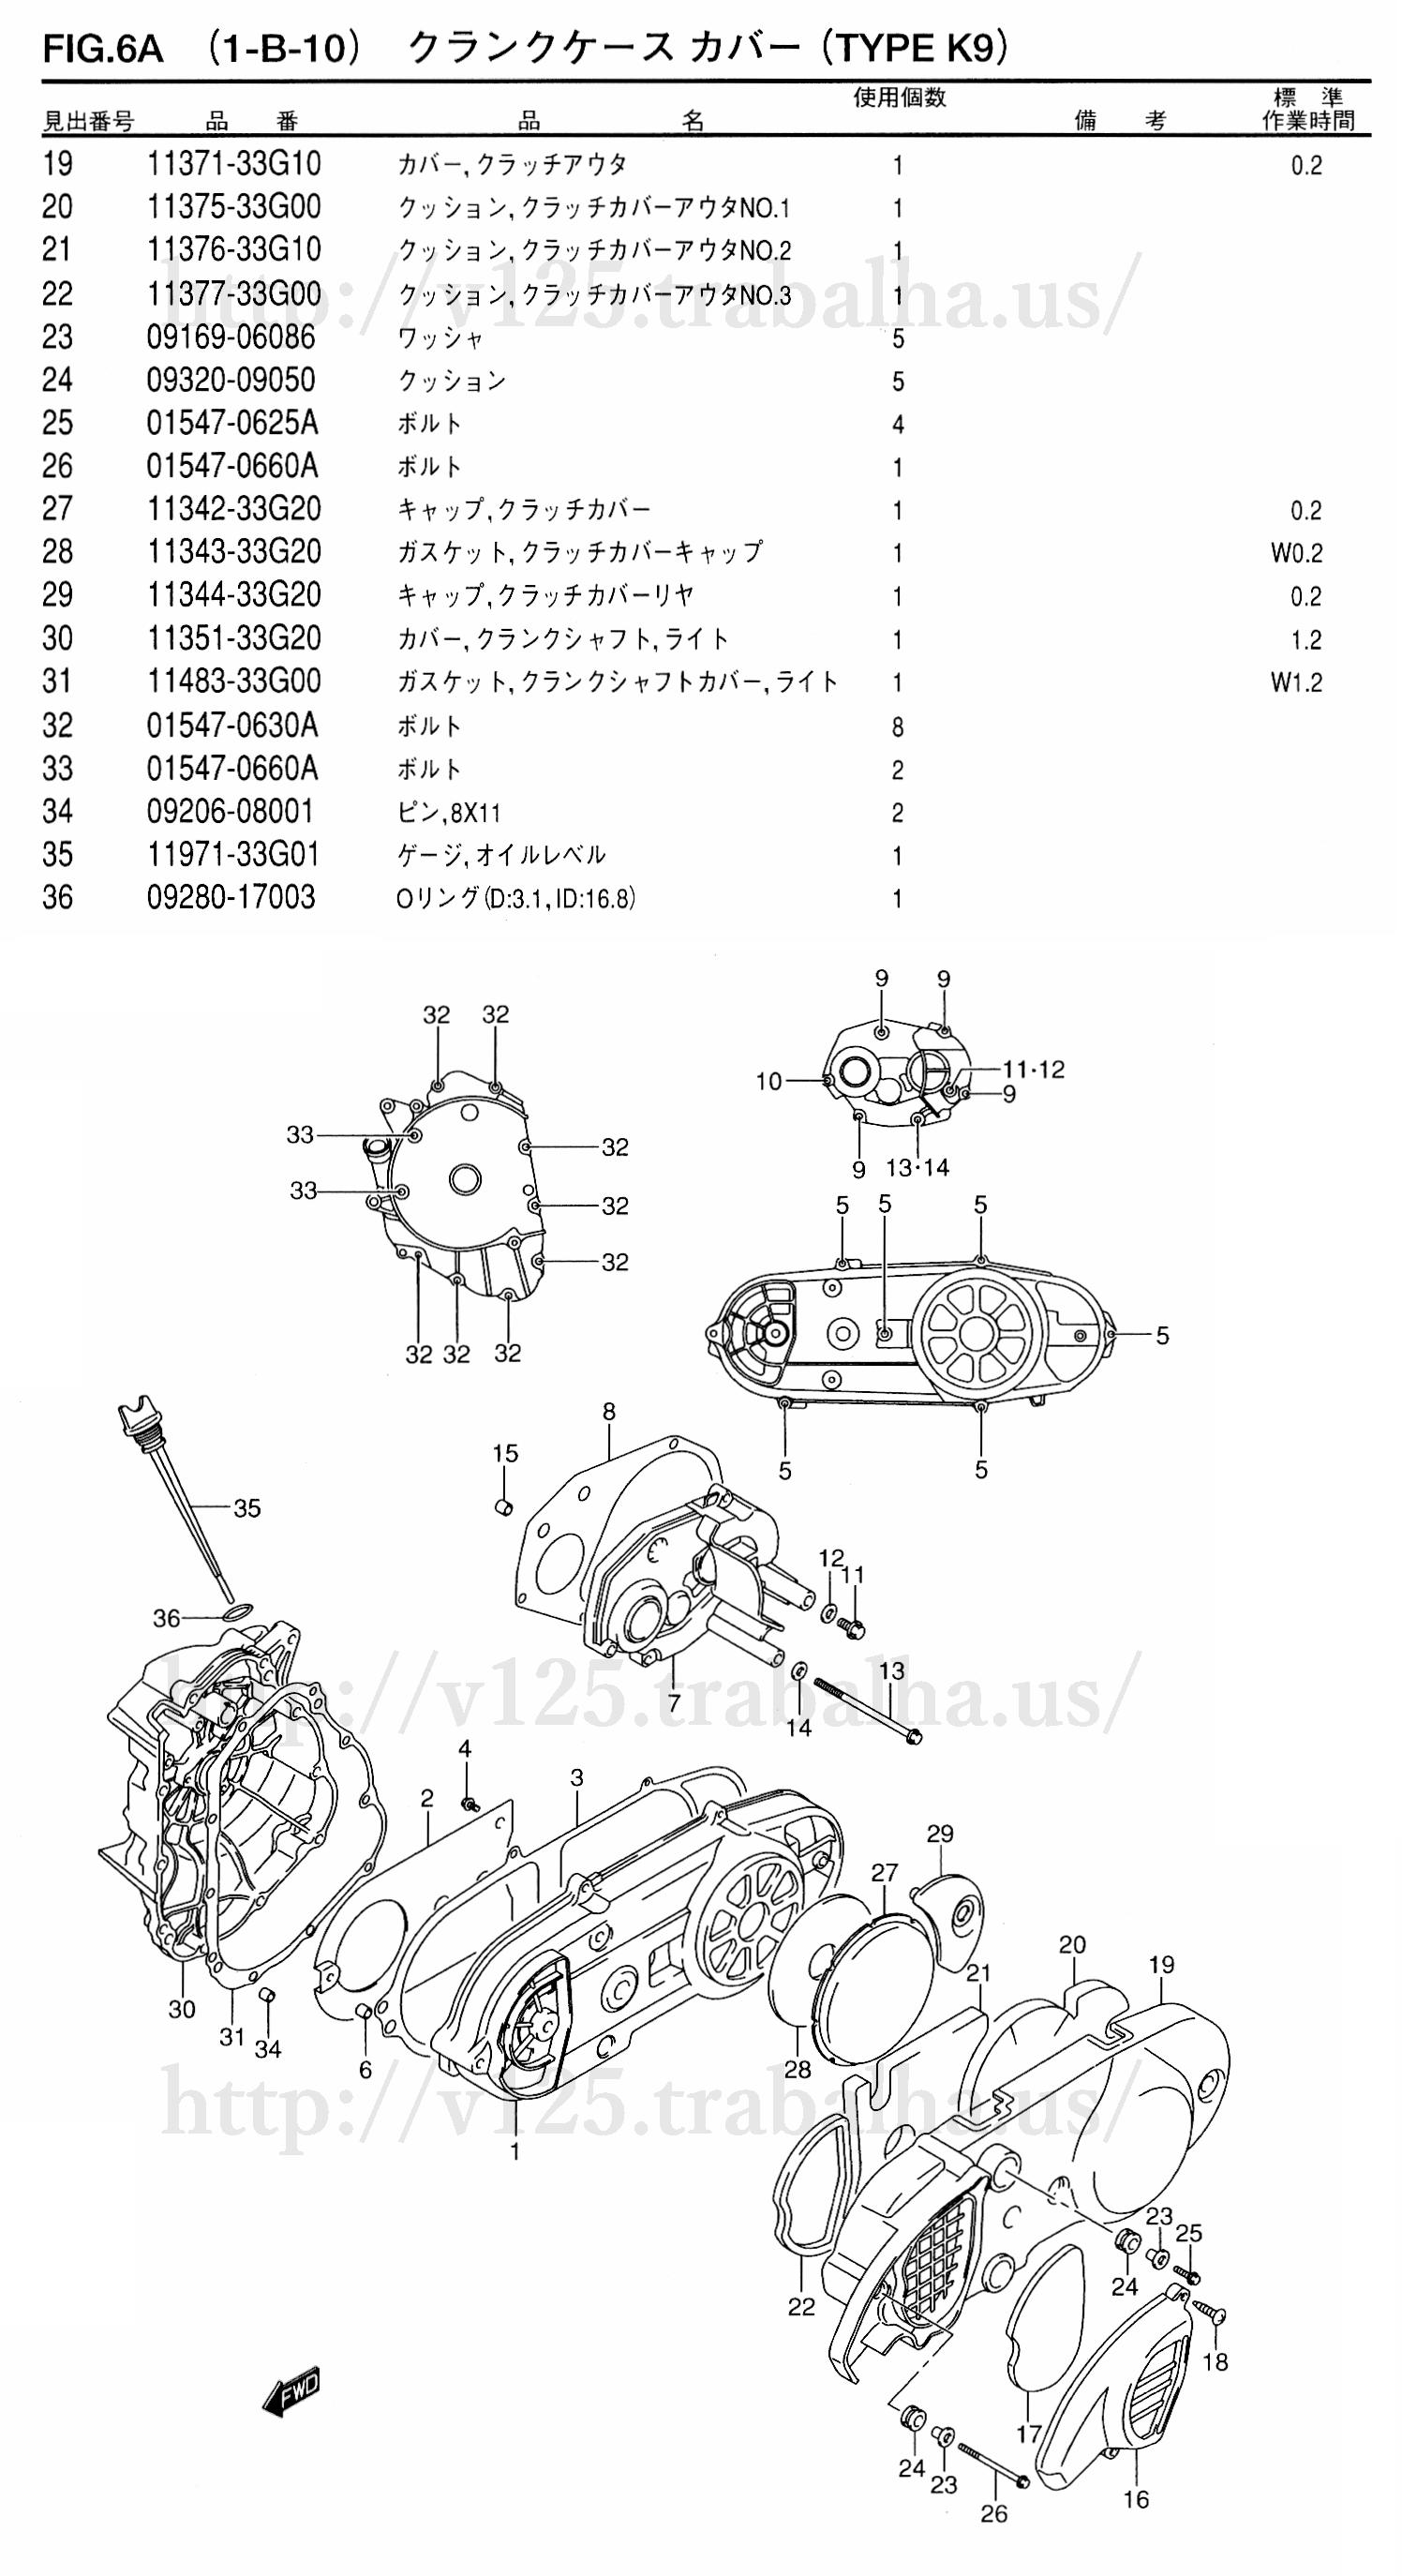 FIG.6A(1-B-10)クランクケースカバー(TYPE K9)